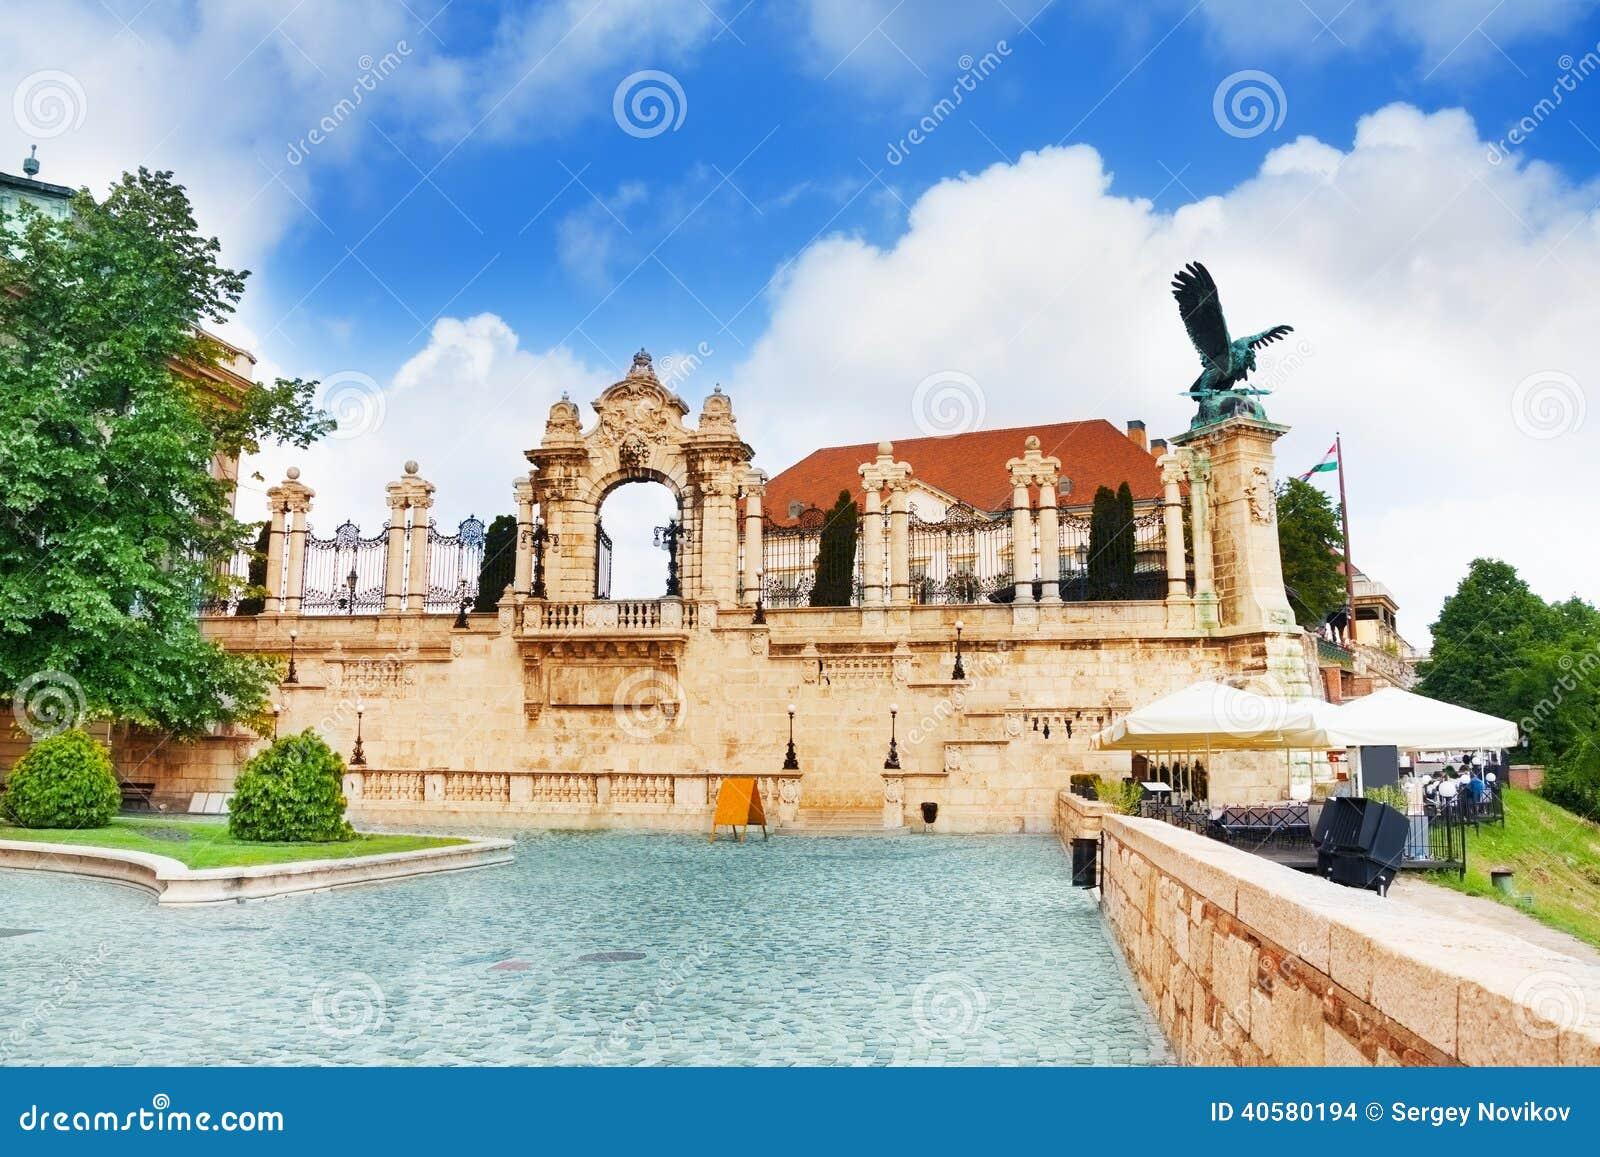 Замок Buda, королевский дворец, строб Habsburg